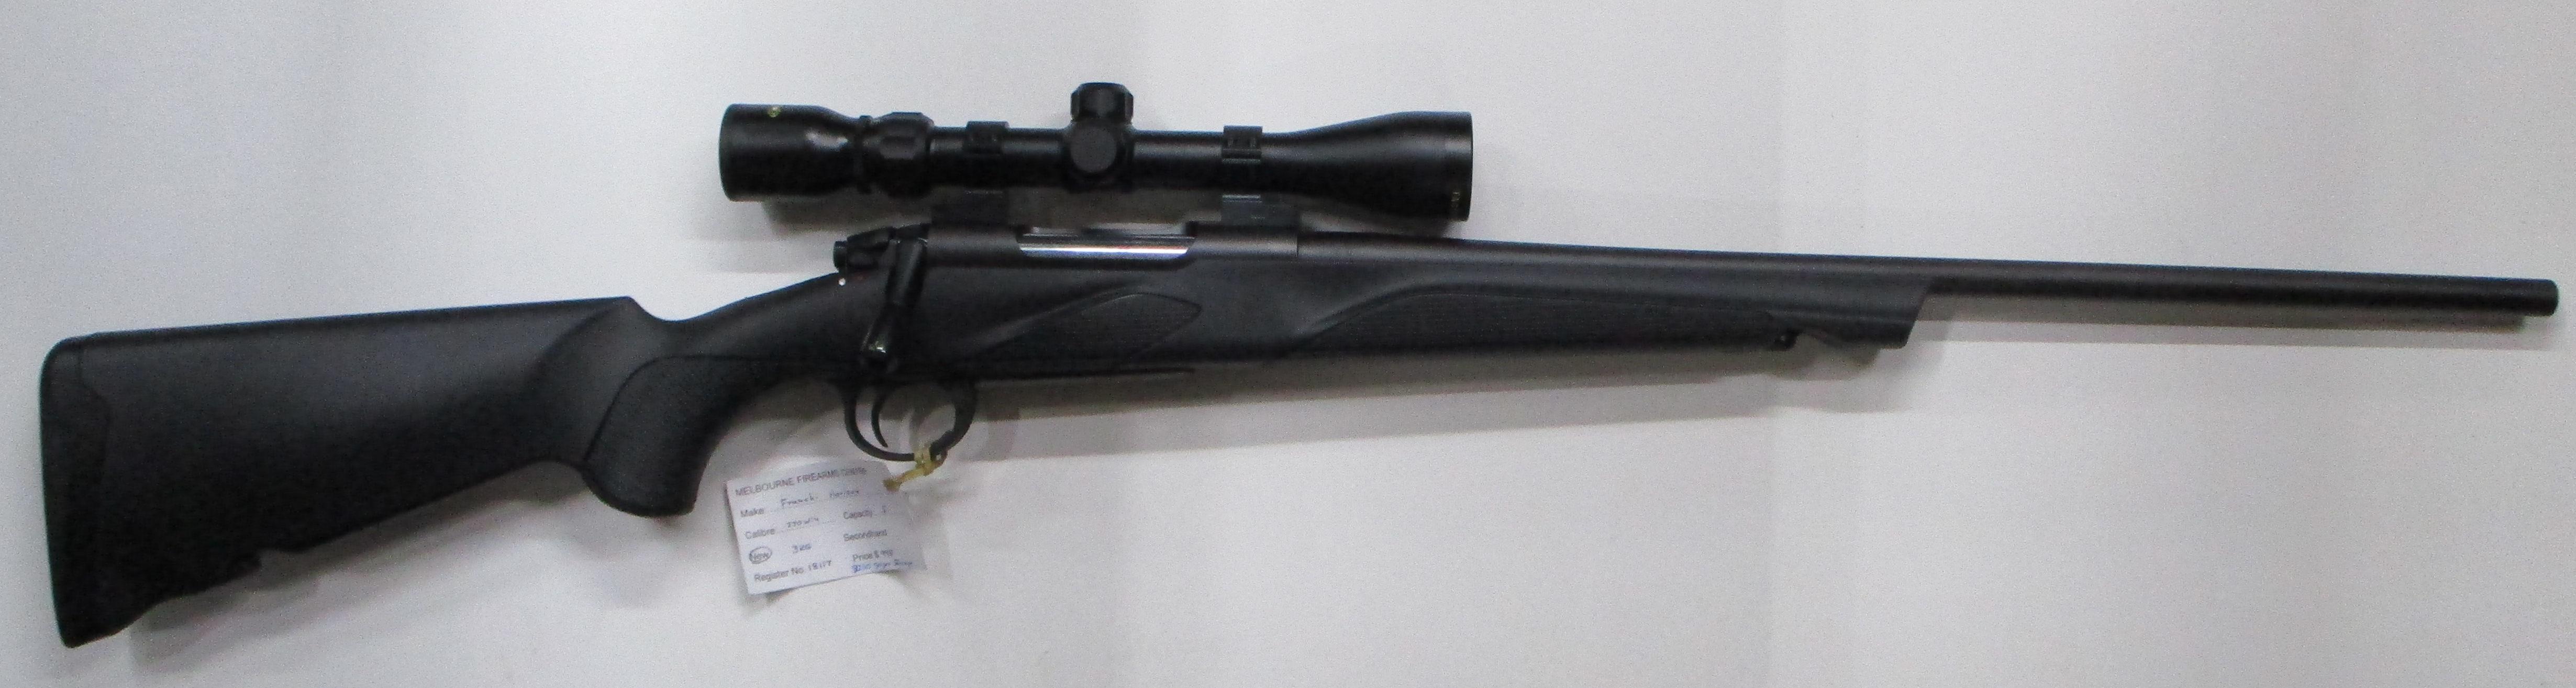 New Firearms Shotguns Sporting Rifles Rifles Centre Fire